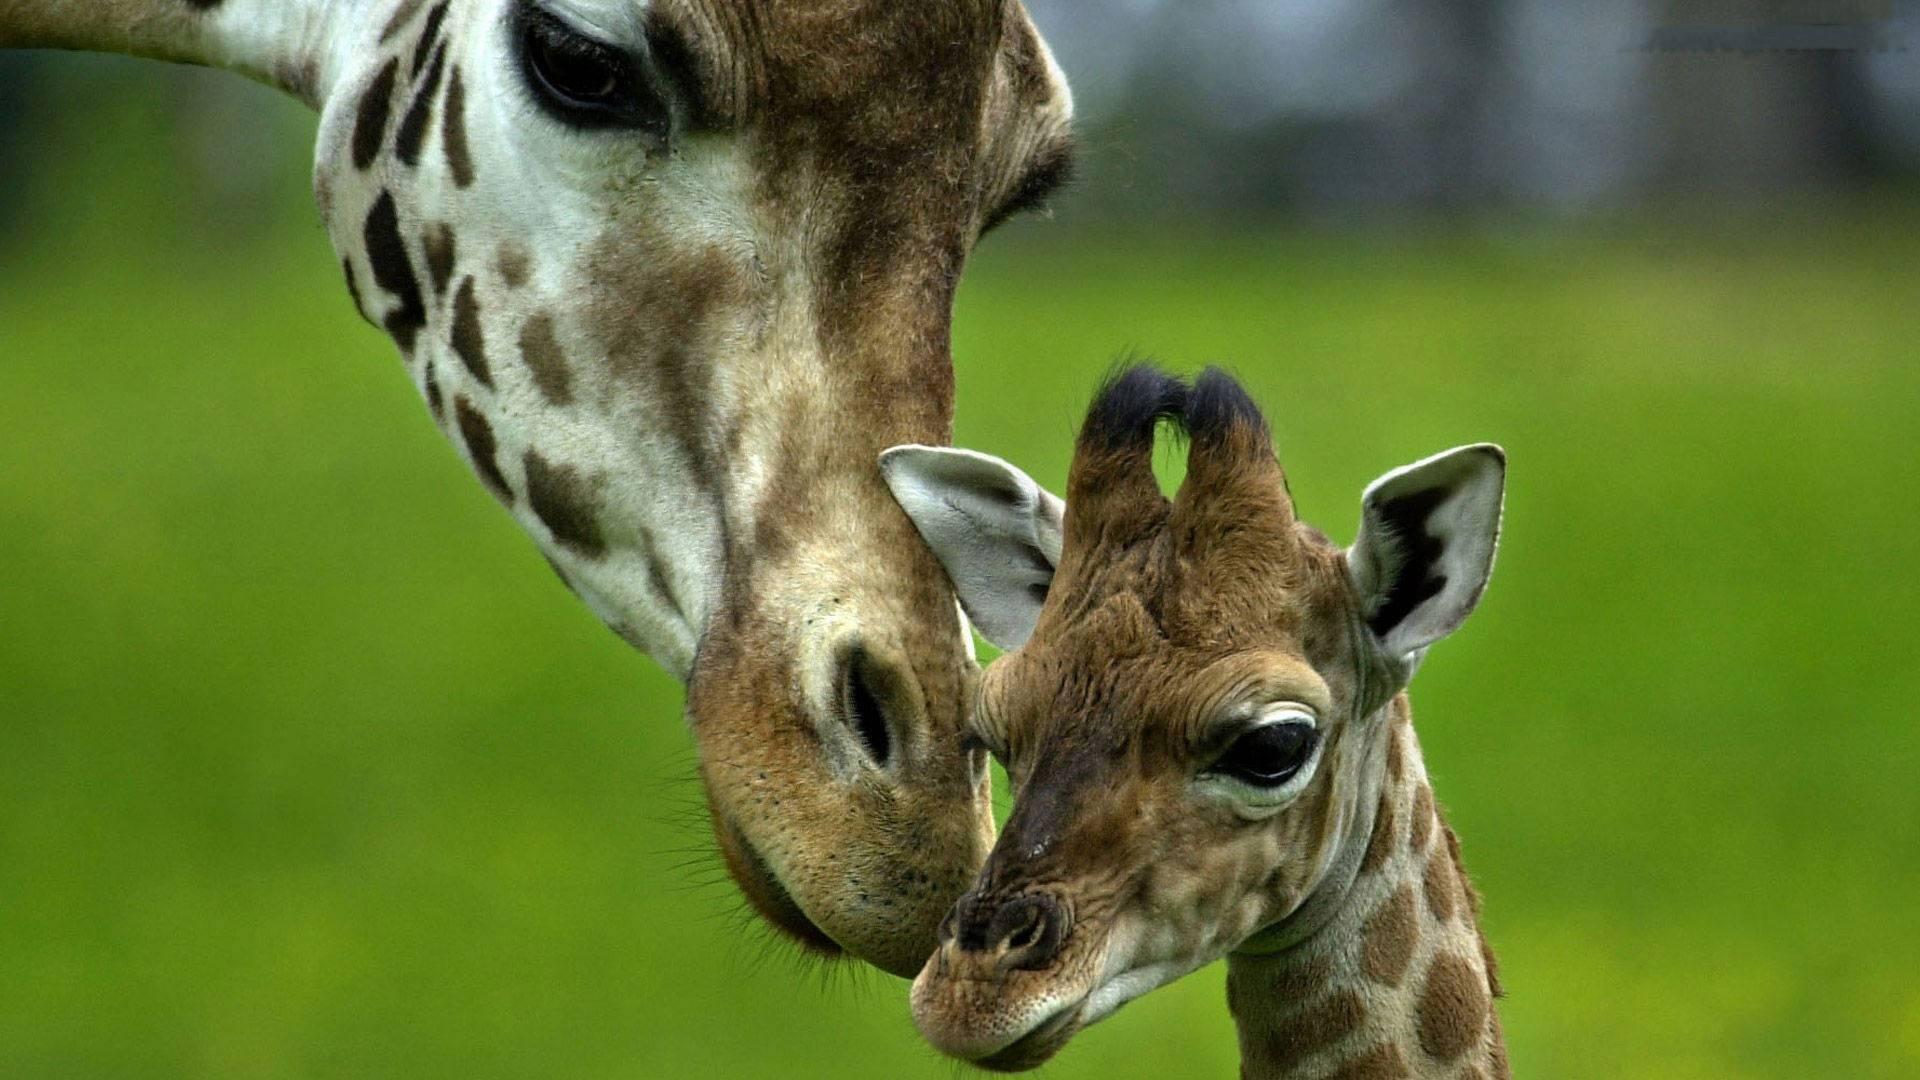 giraffe baby wallpaper background